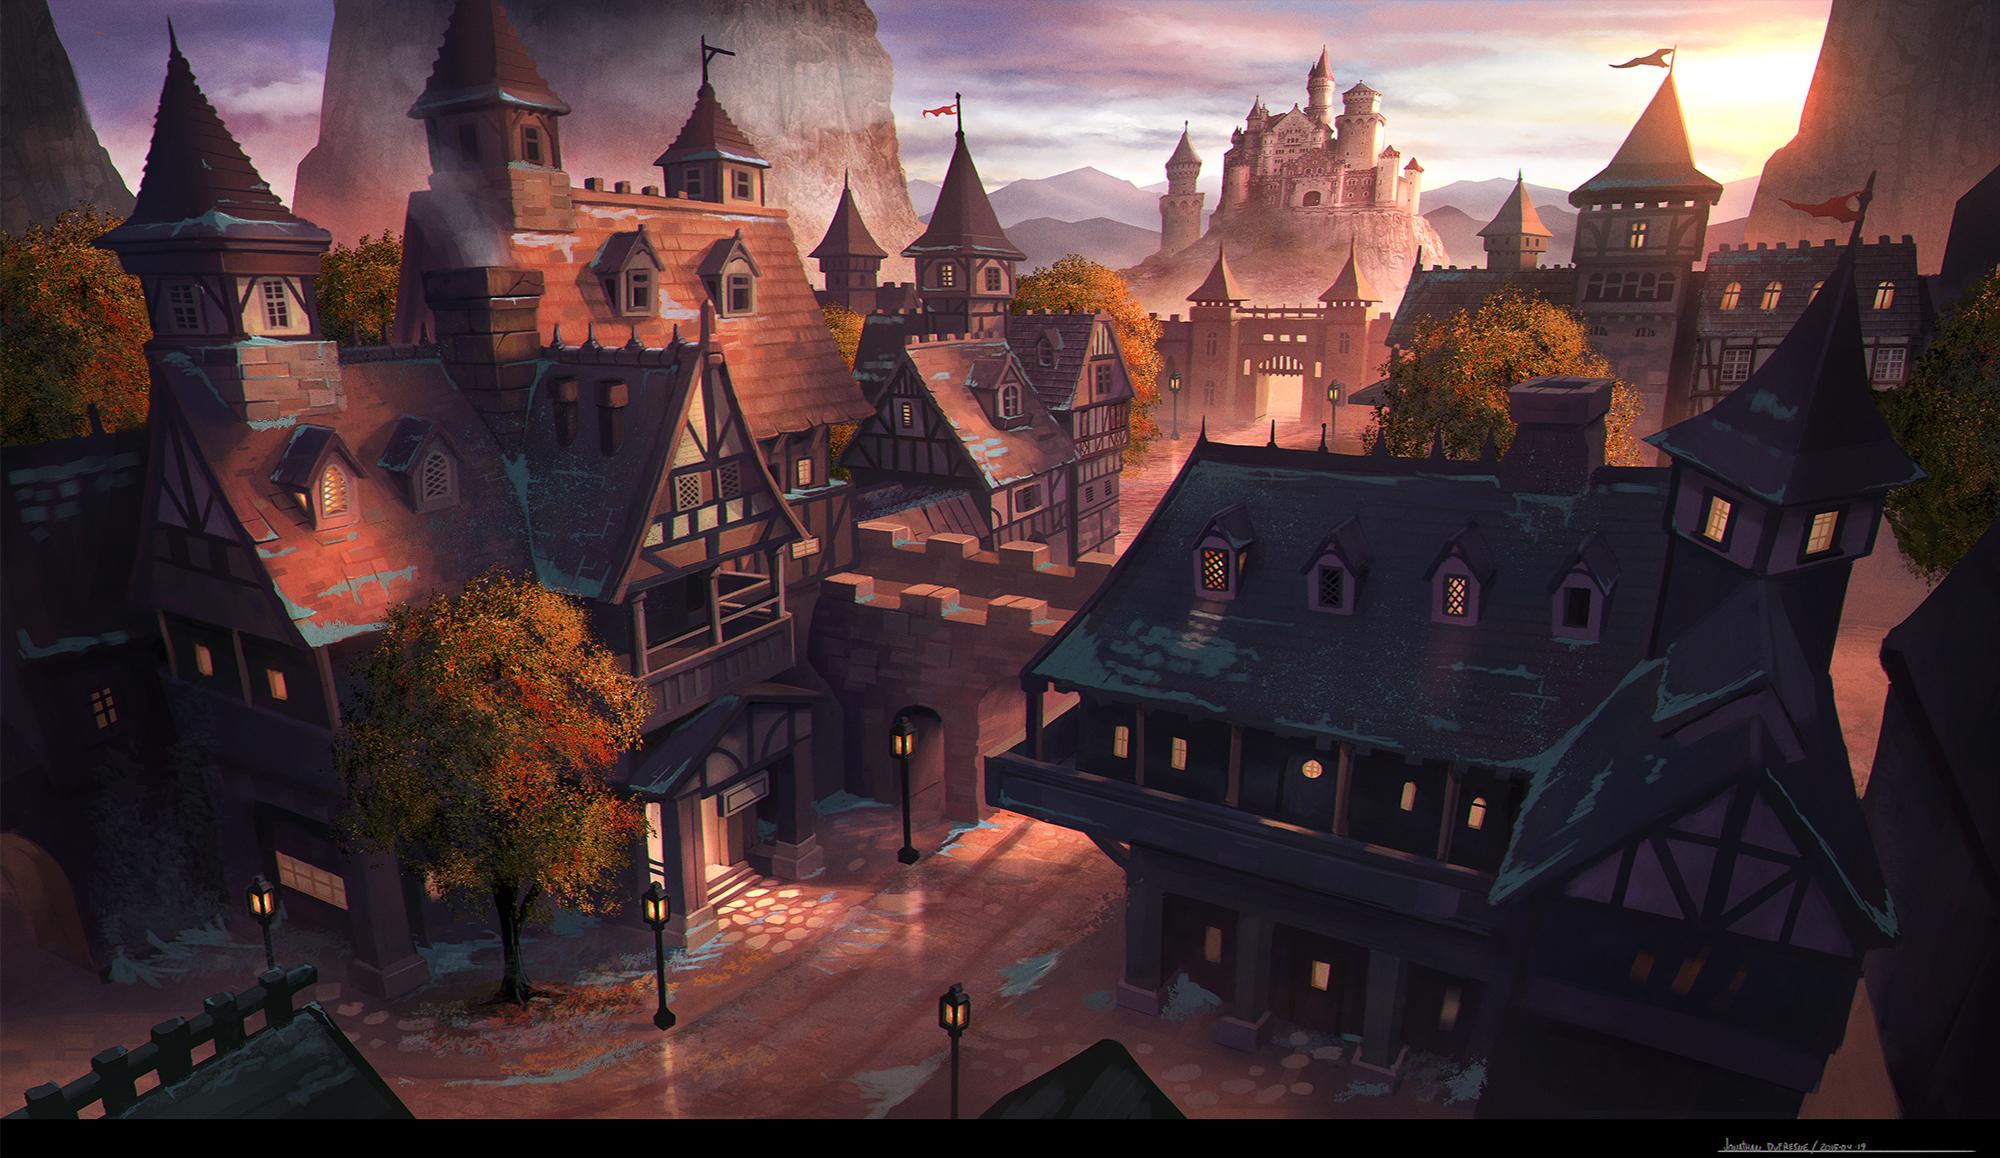 https://img3.goodfon.ru/original/2000x1158/1/b4/medieval-castle-town-middle.jpg